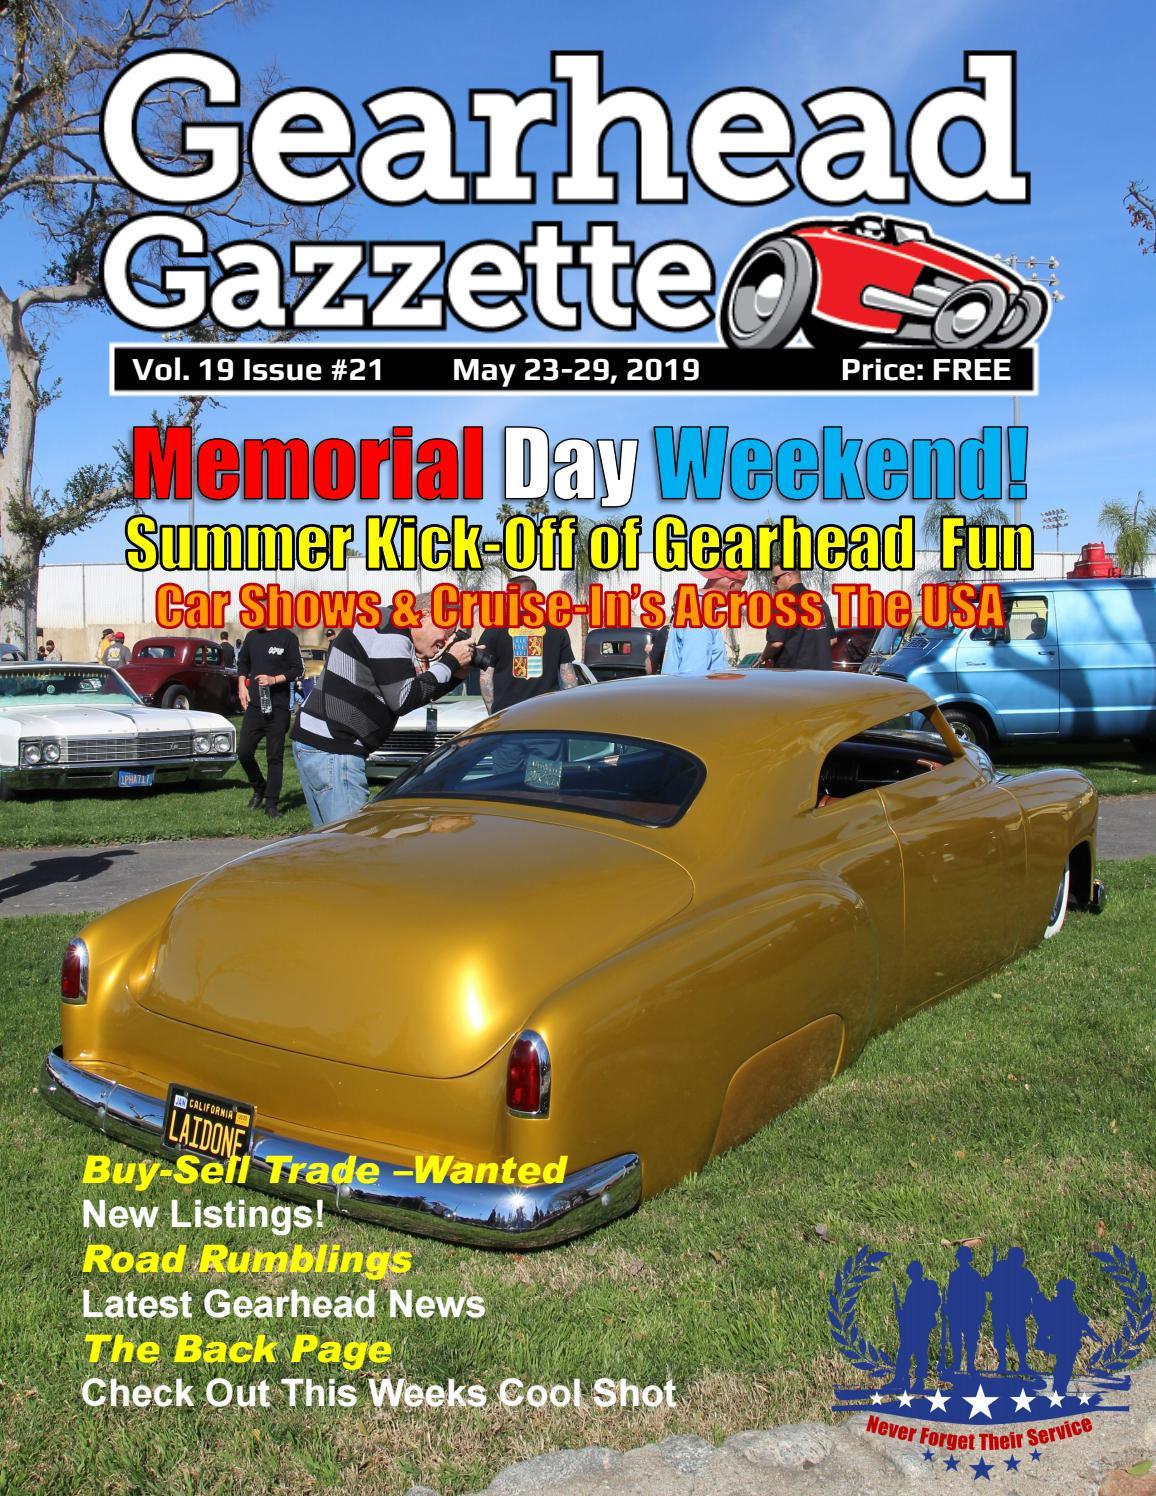 Gearhead Gazzette Vol 19 Issue #21 May 23-29, 2019 by Jimmy